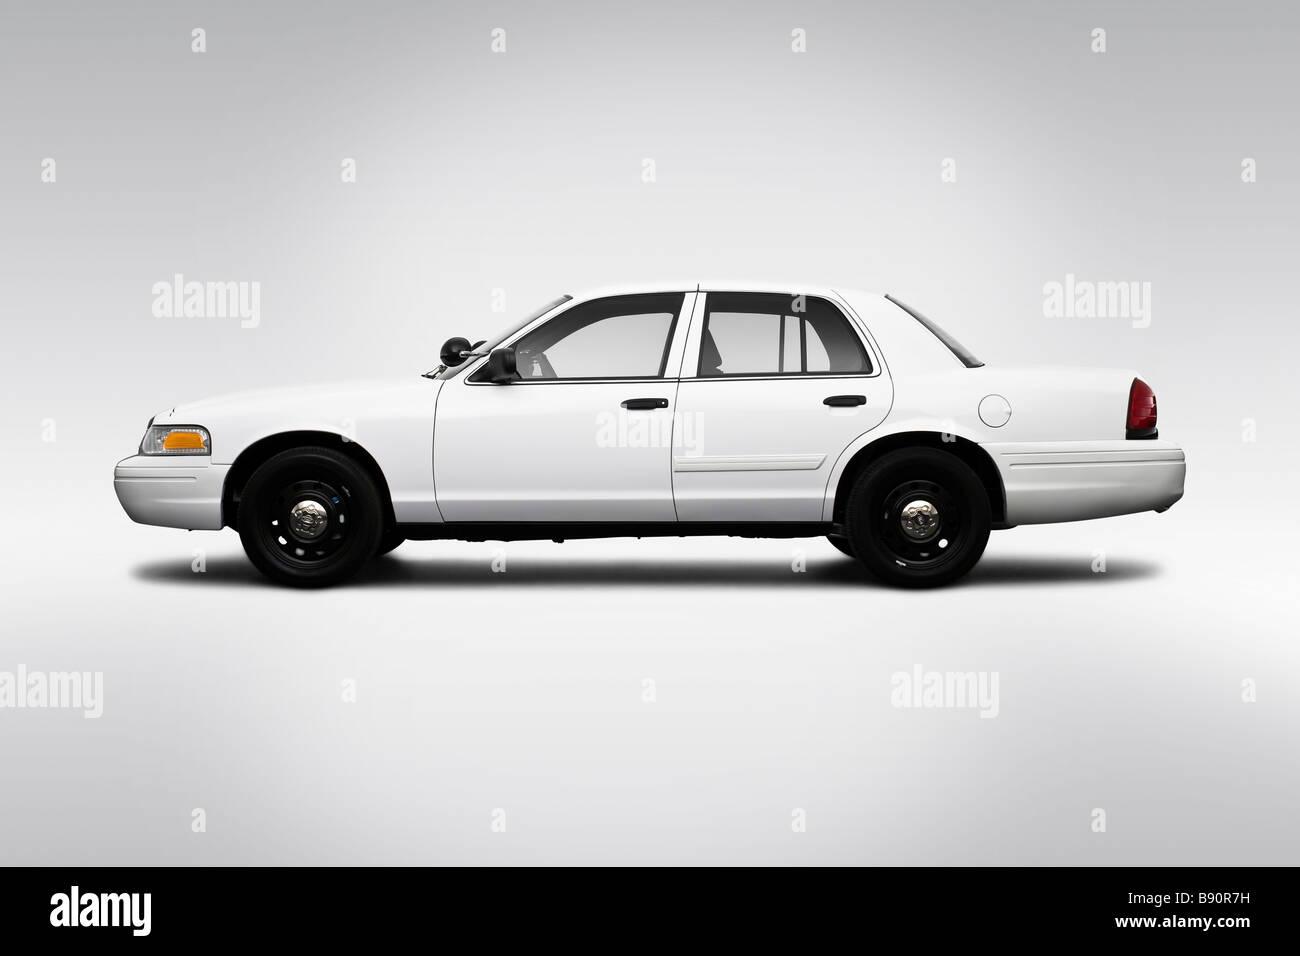 2009 ford crown victoria police interceptor in white. Black Bedroom Furniture Sets. Home Design Ideas